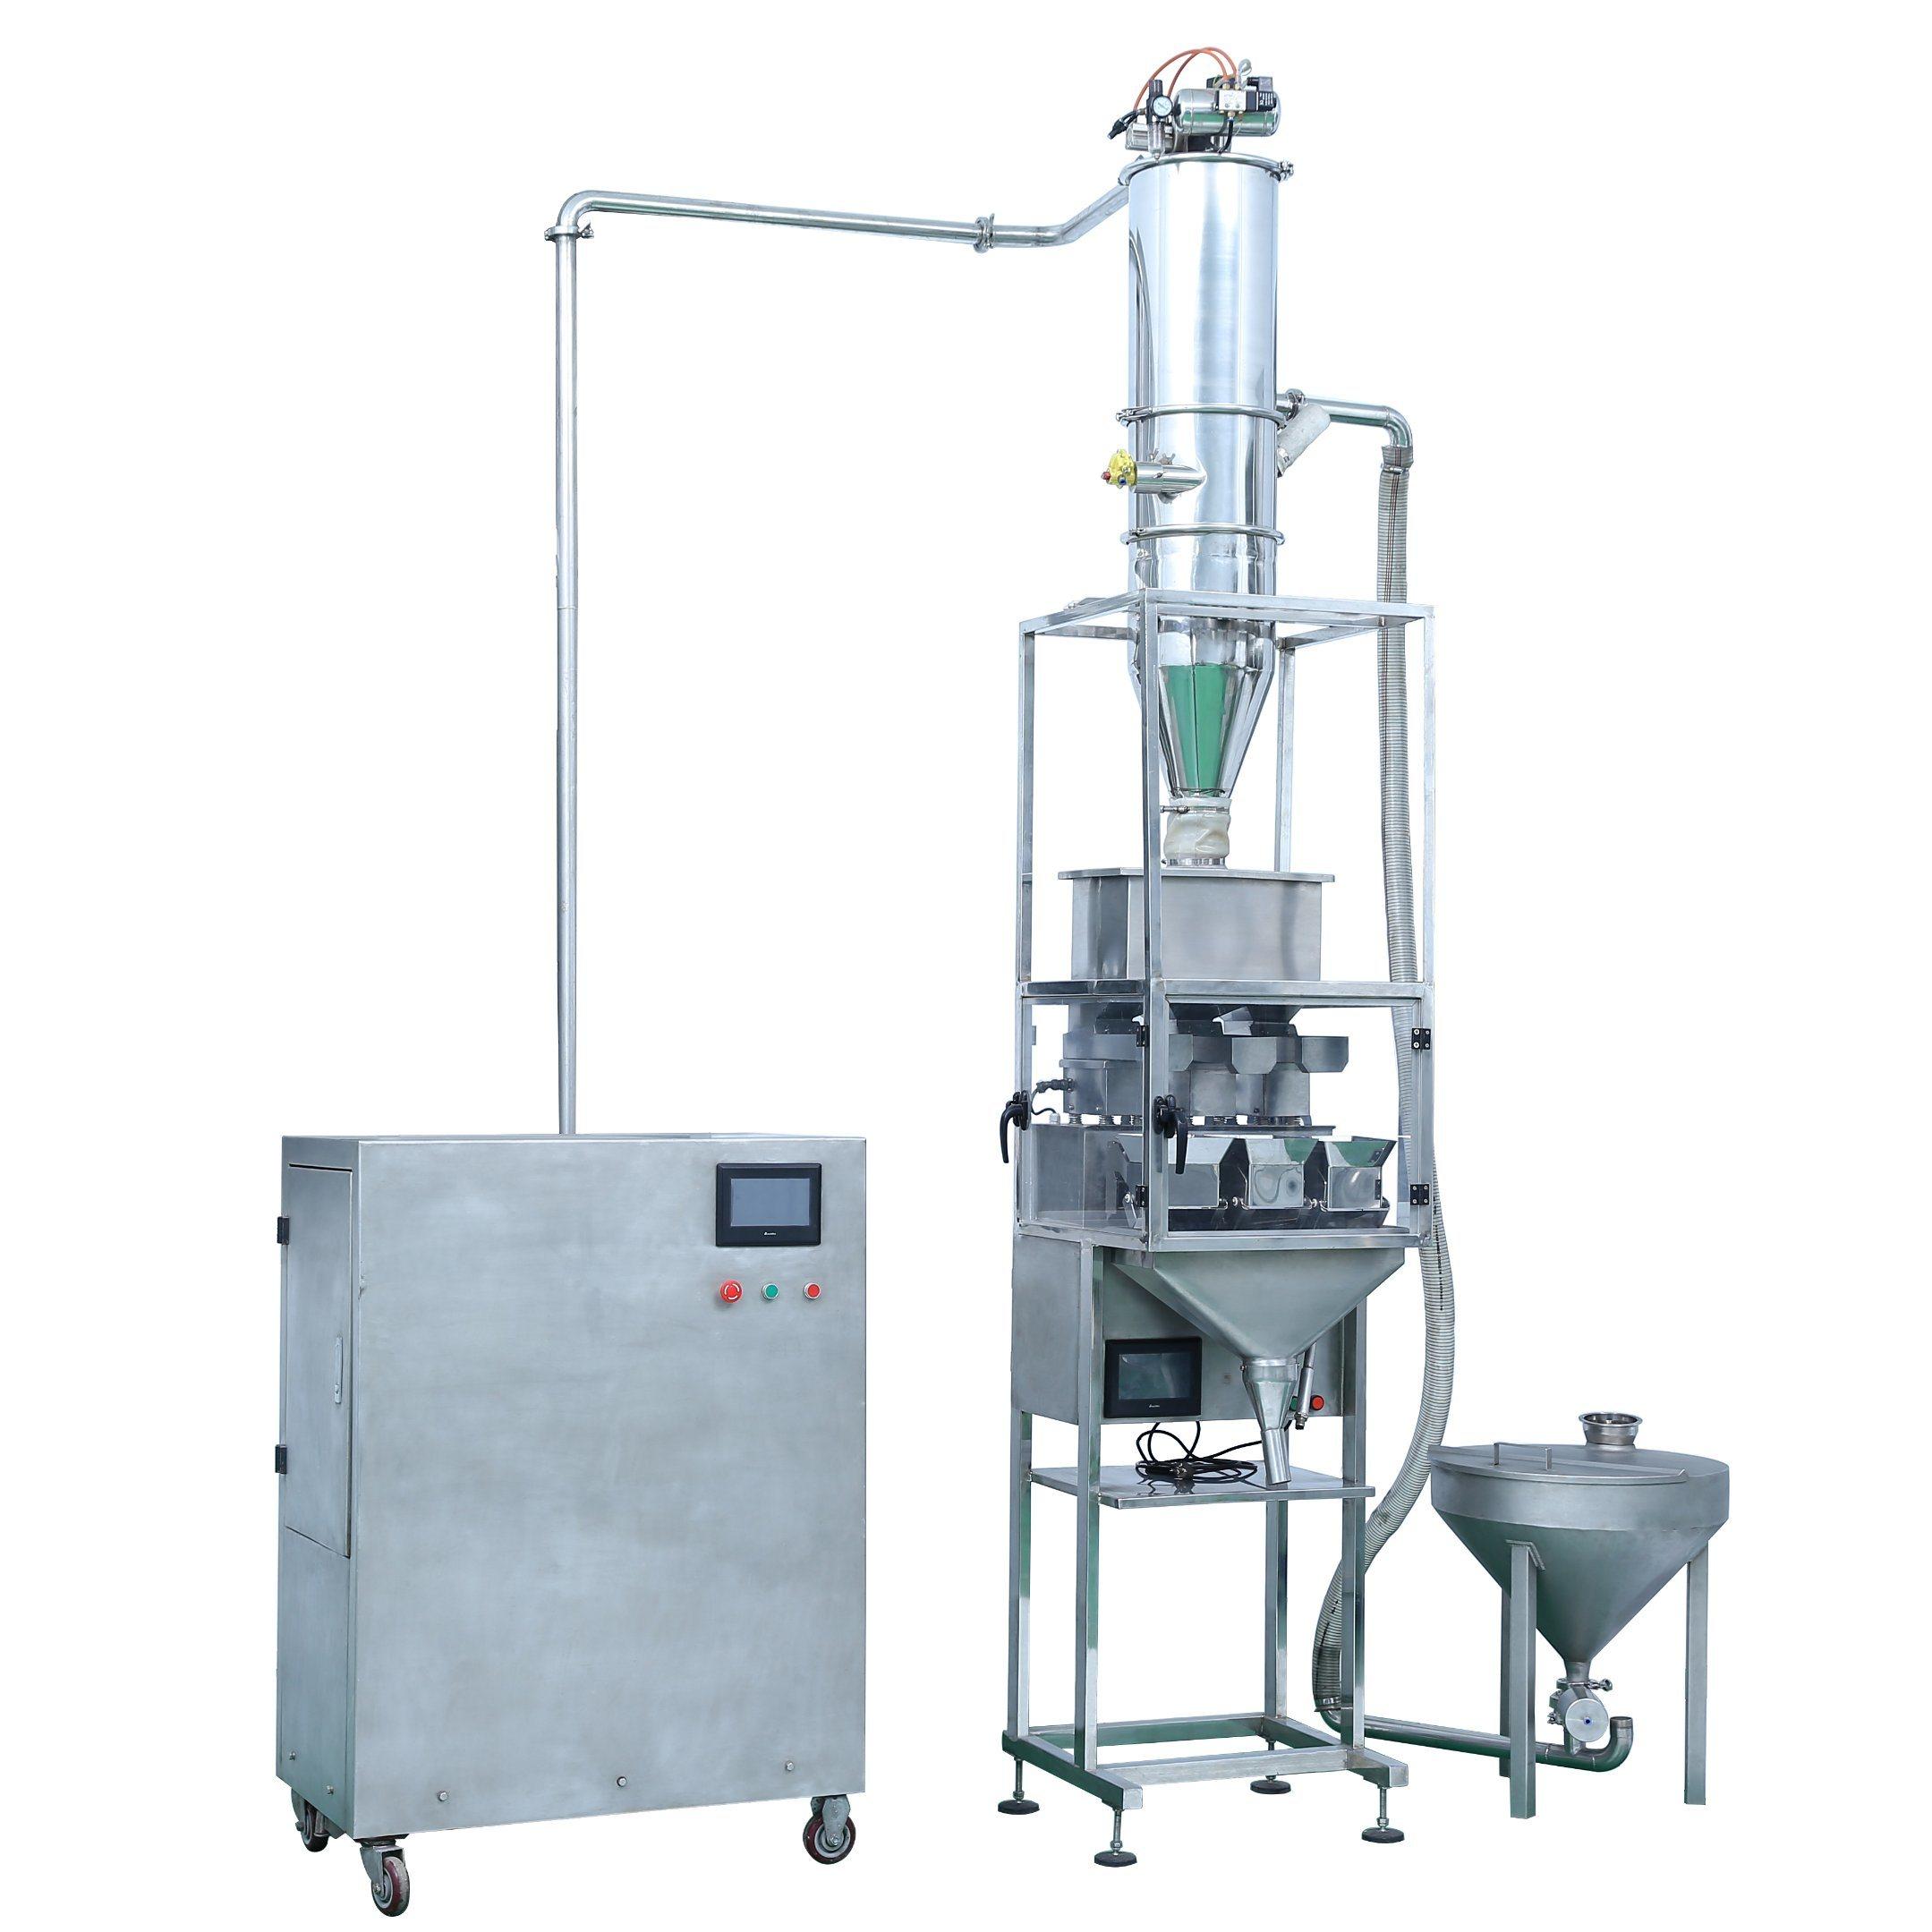 Nuoen Pneumatic Vacuum Feeding Machine for Particles/Powder